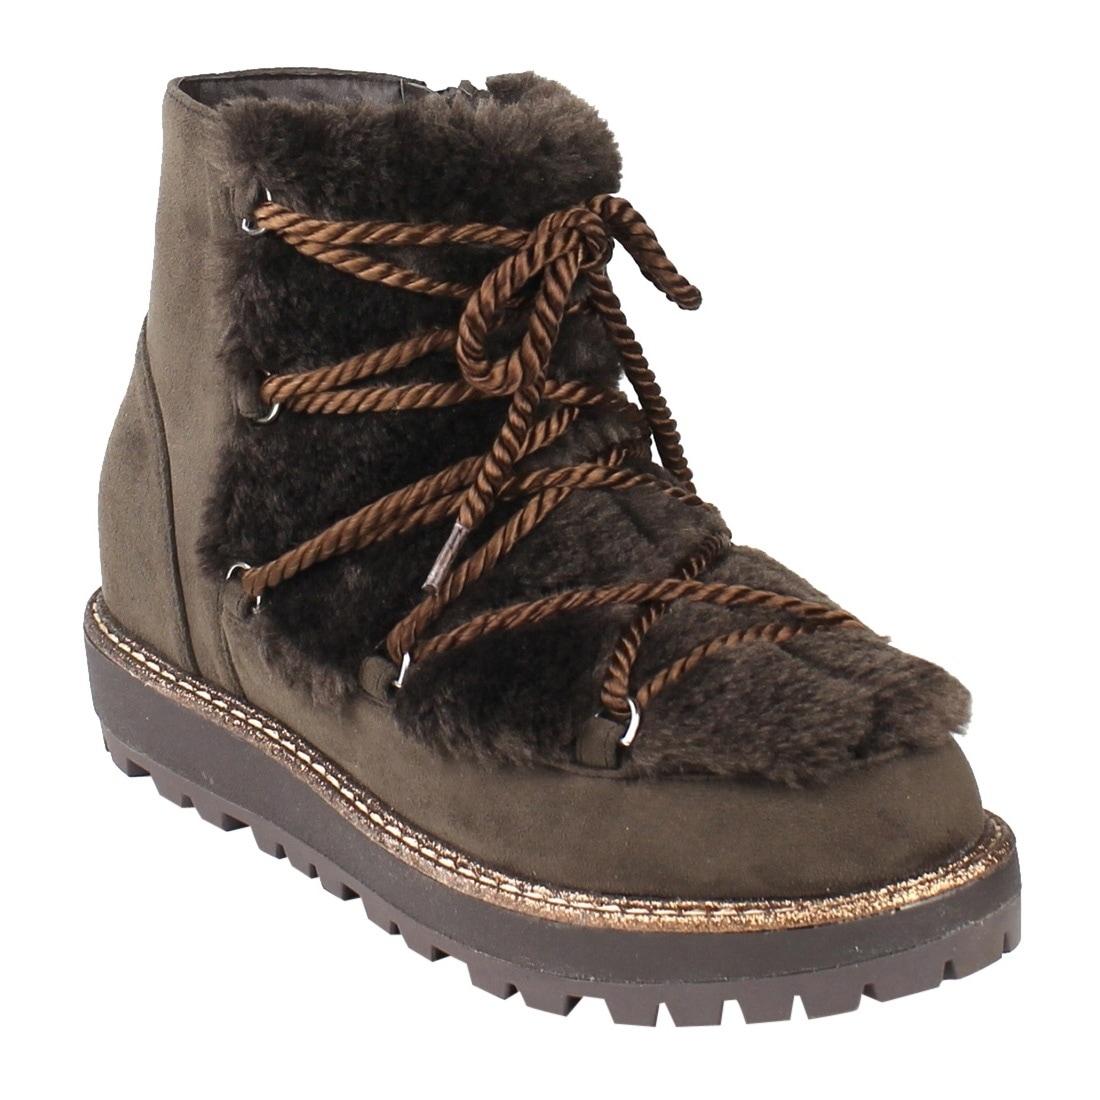 FM21 Women's Strappy Ankle High Side Zipper Lug Sole Winter Snow Booties